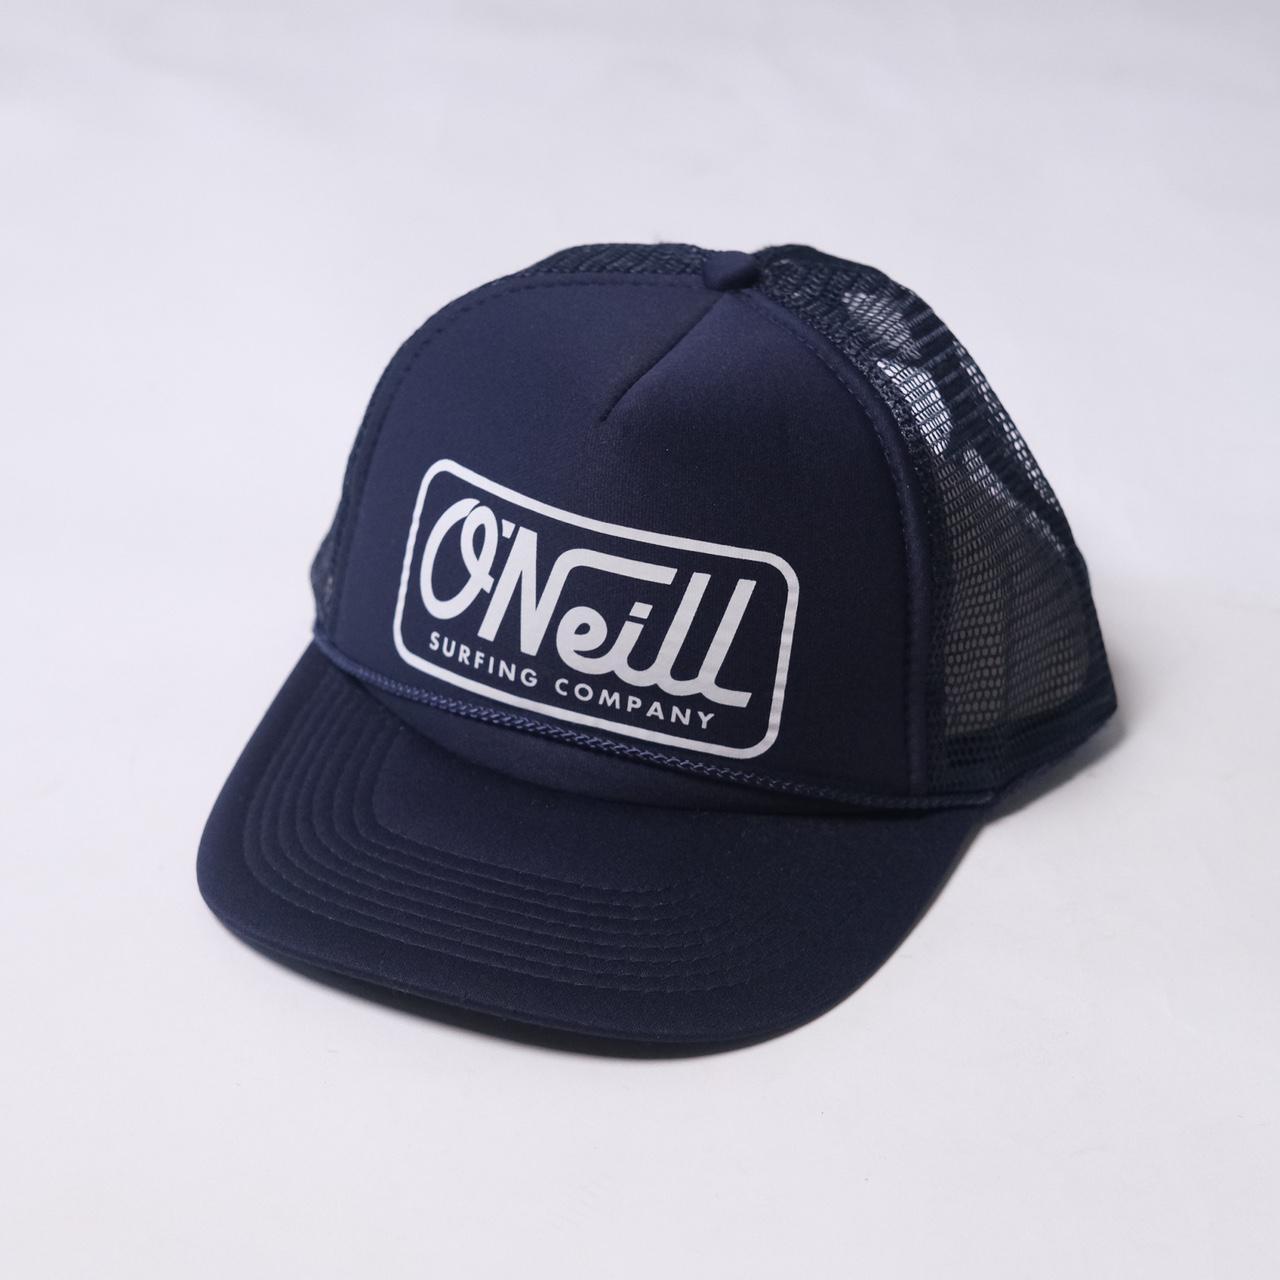 Product Image 1 - O'Neill Surfing Mesh Trucker Snapback